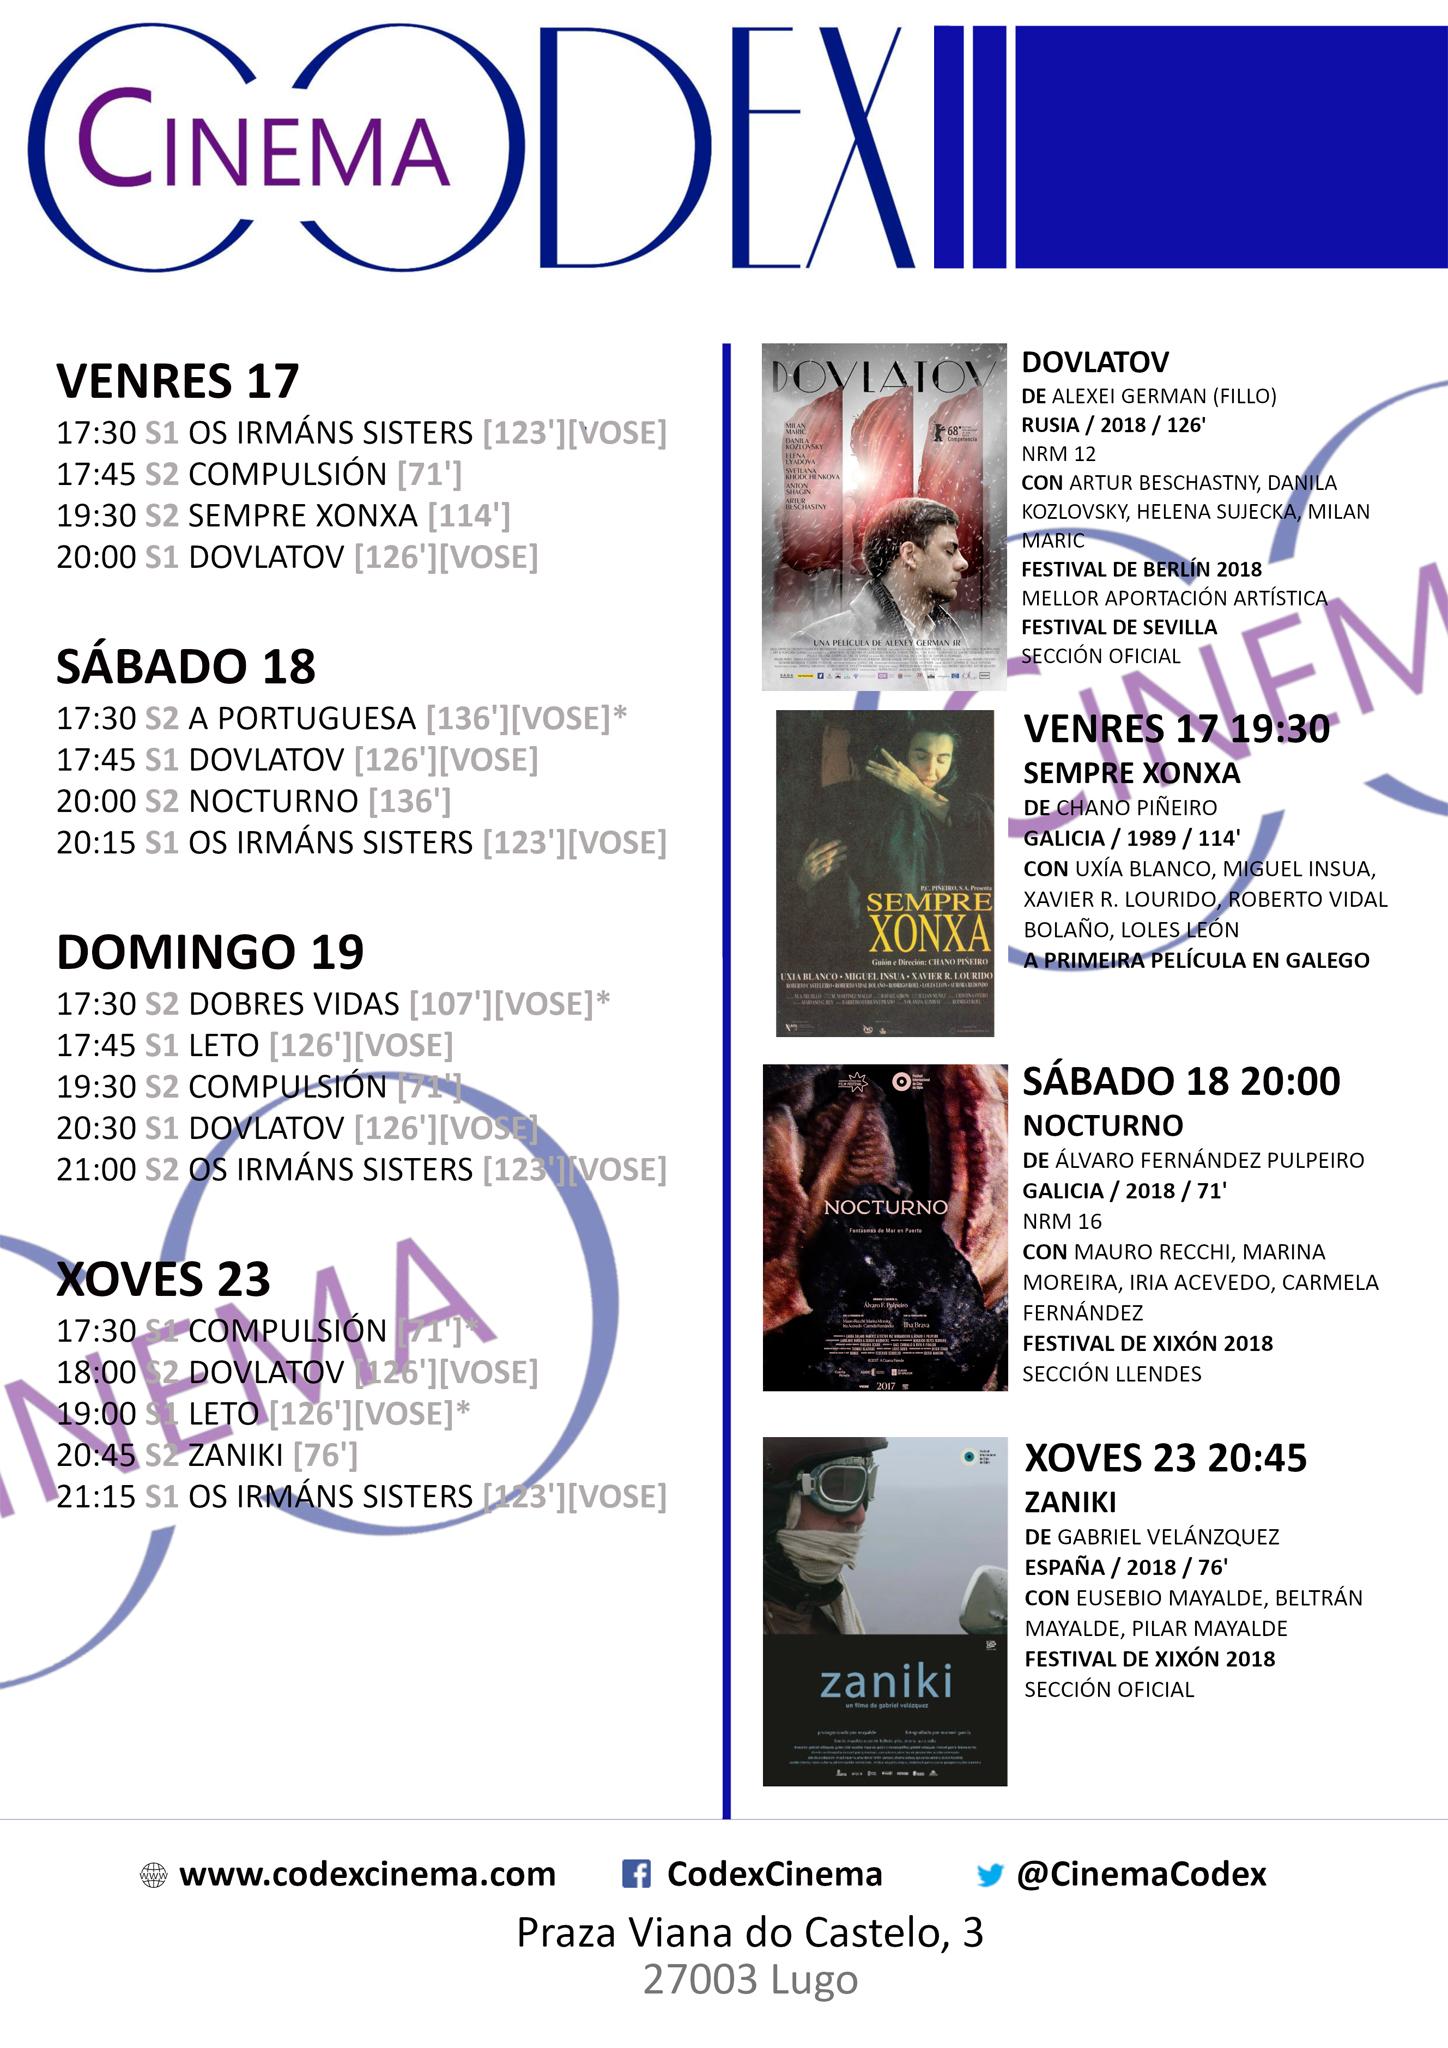 Películas no Codex Cinema 17 ao 23 de maio